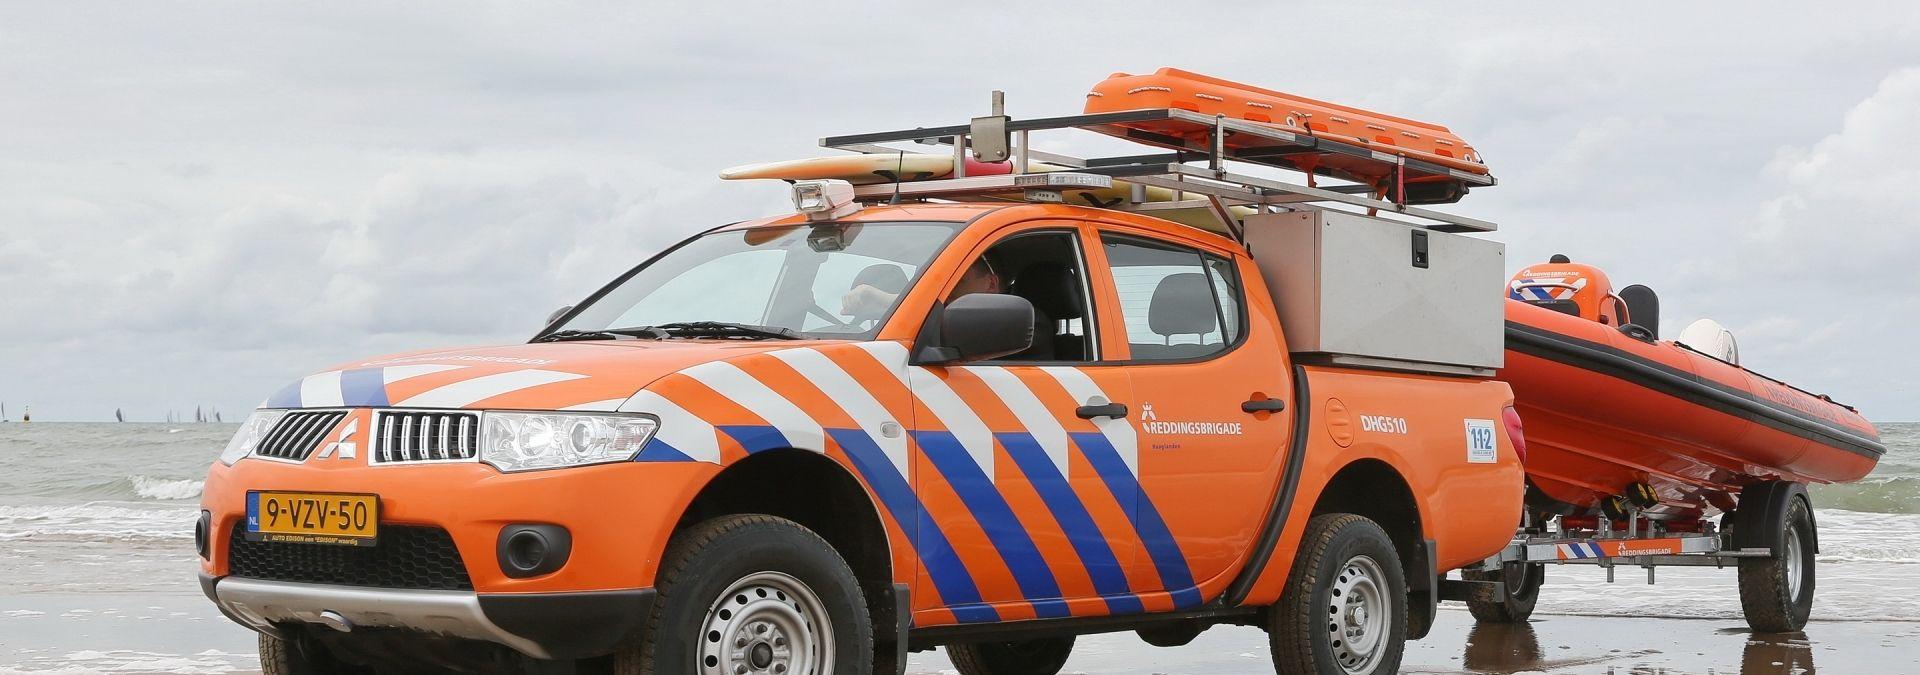 Reddingsbrigade strandvoertuig| Foto: Ko van Leeuwen